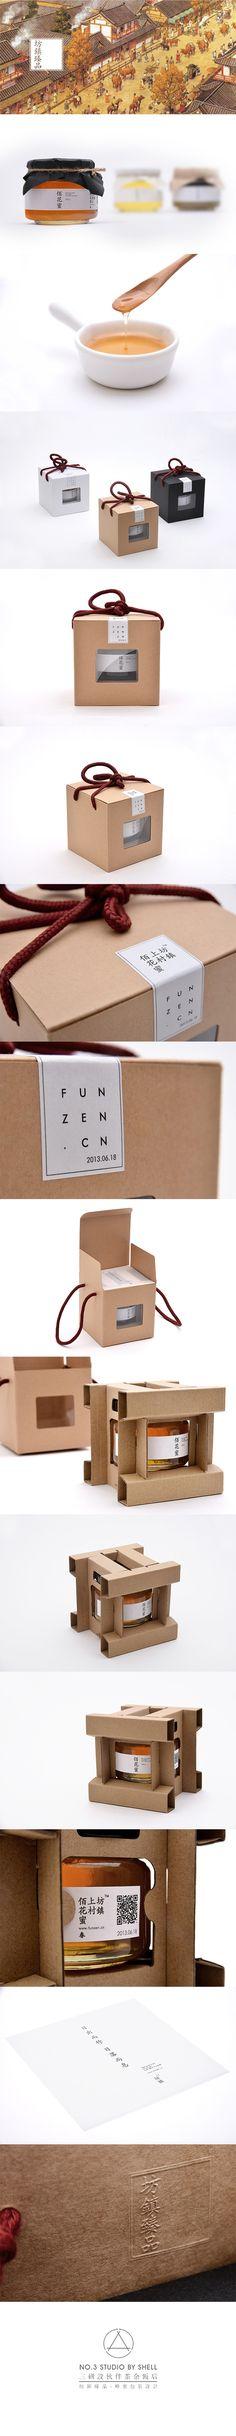 "[ 三研设 (Via Xini Bittersweet - ""Packaging"" board)] http://www.pinterest.com/xinixinixinita/packaging/"